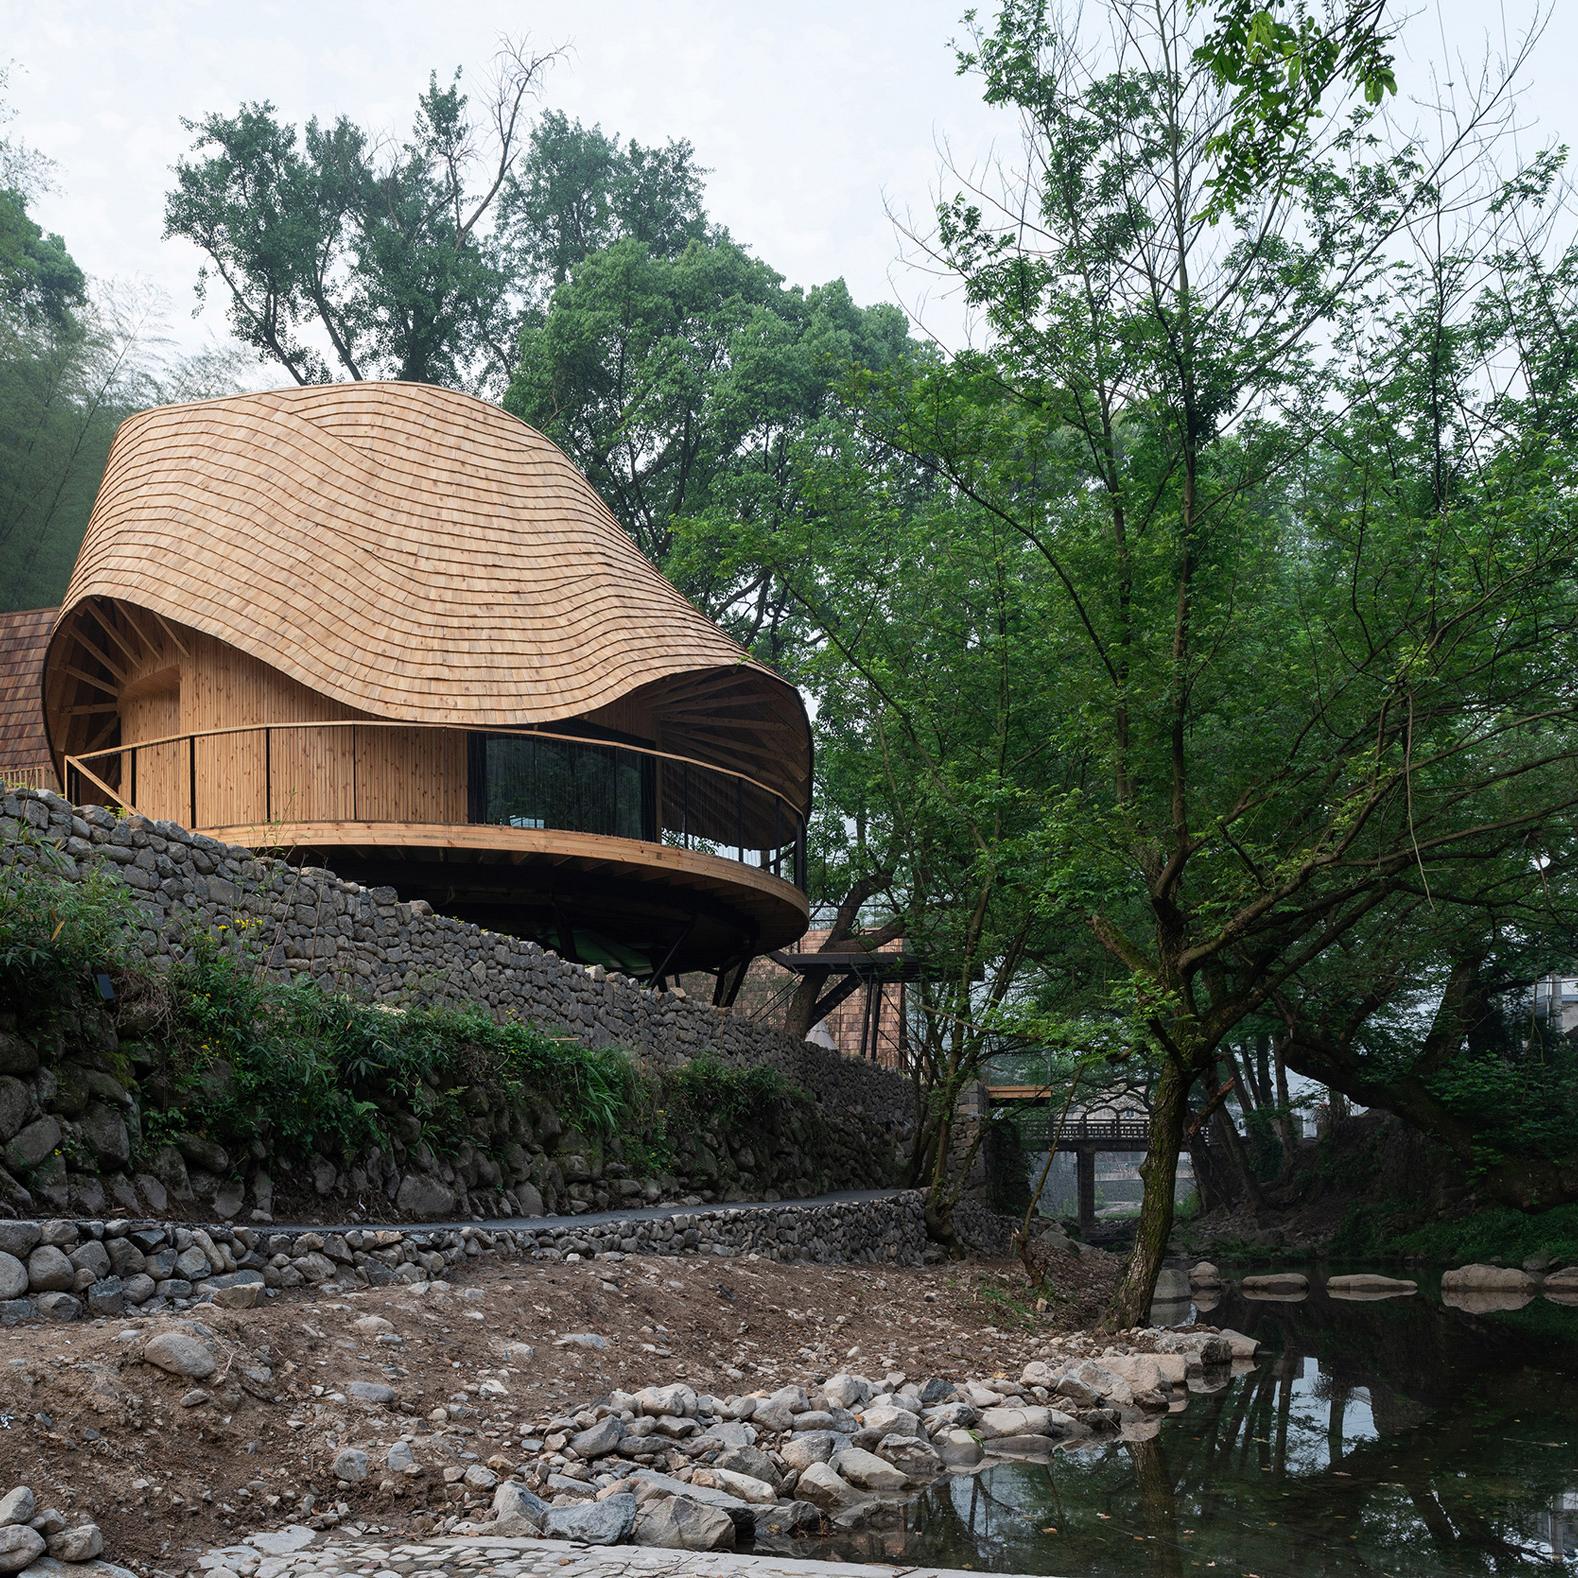 Dezeen's top 10 houses of 2018: Treewow Retreat, China, byMonoarchi